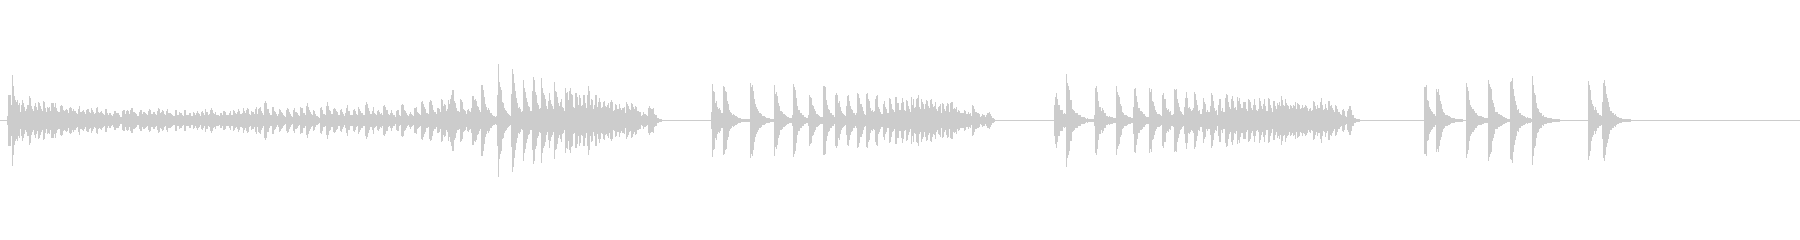 大太鼓31打出ドロ歌舞伎情景描写和風和太の未再生の波形